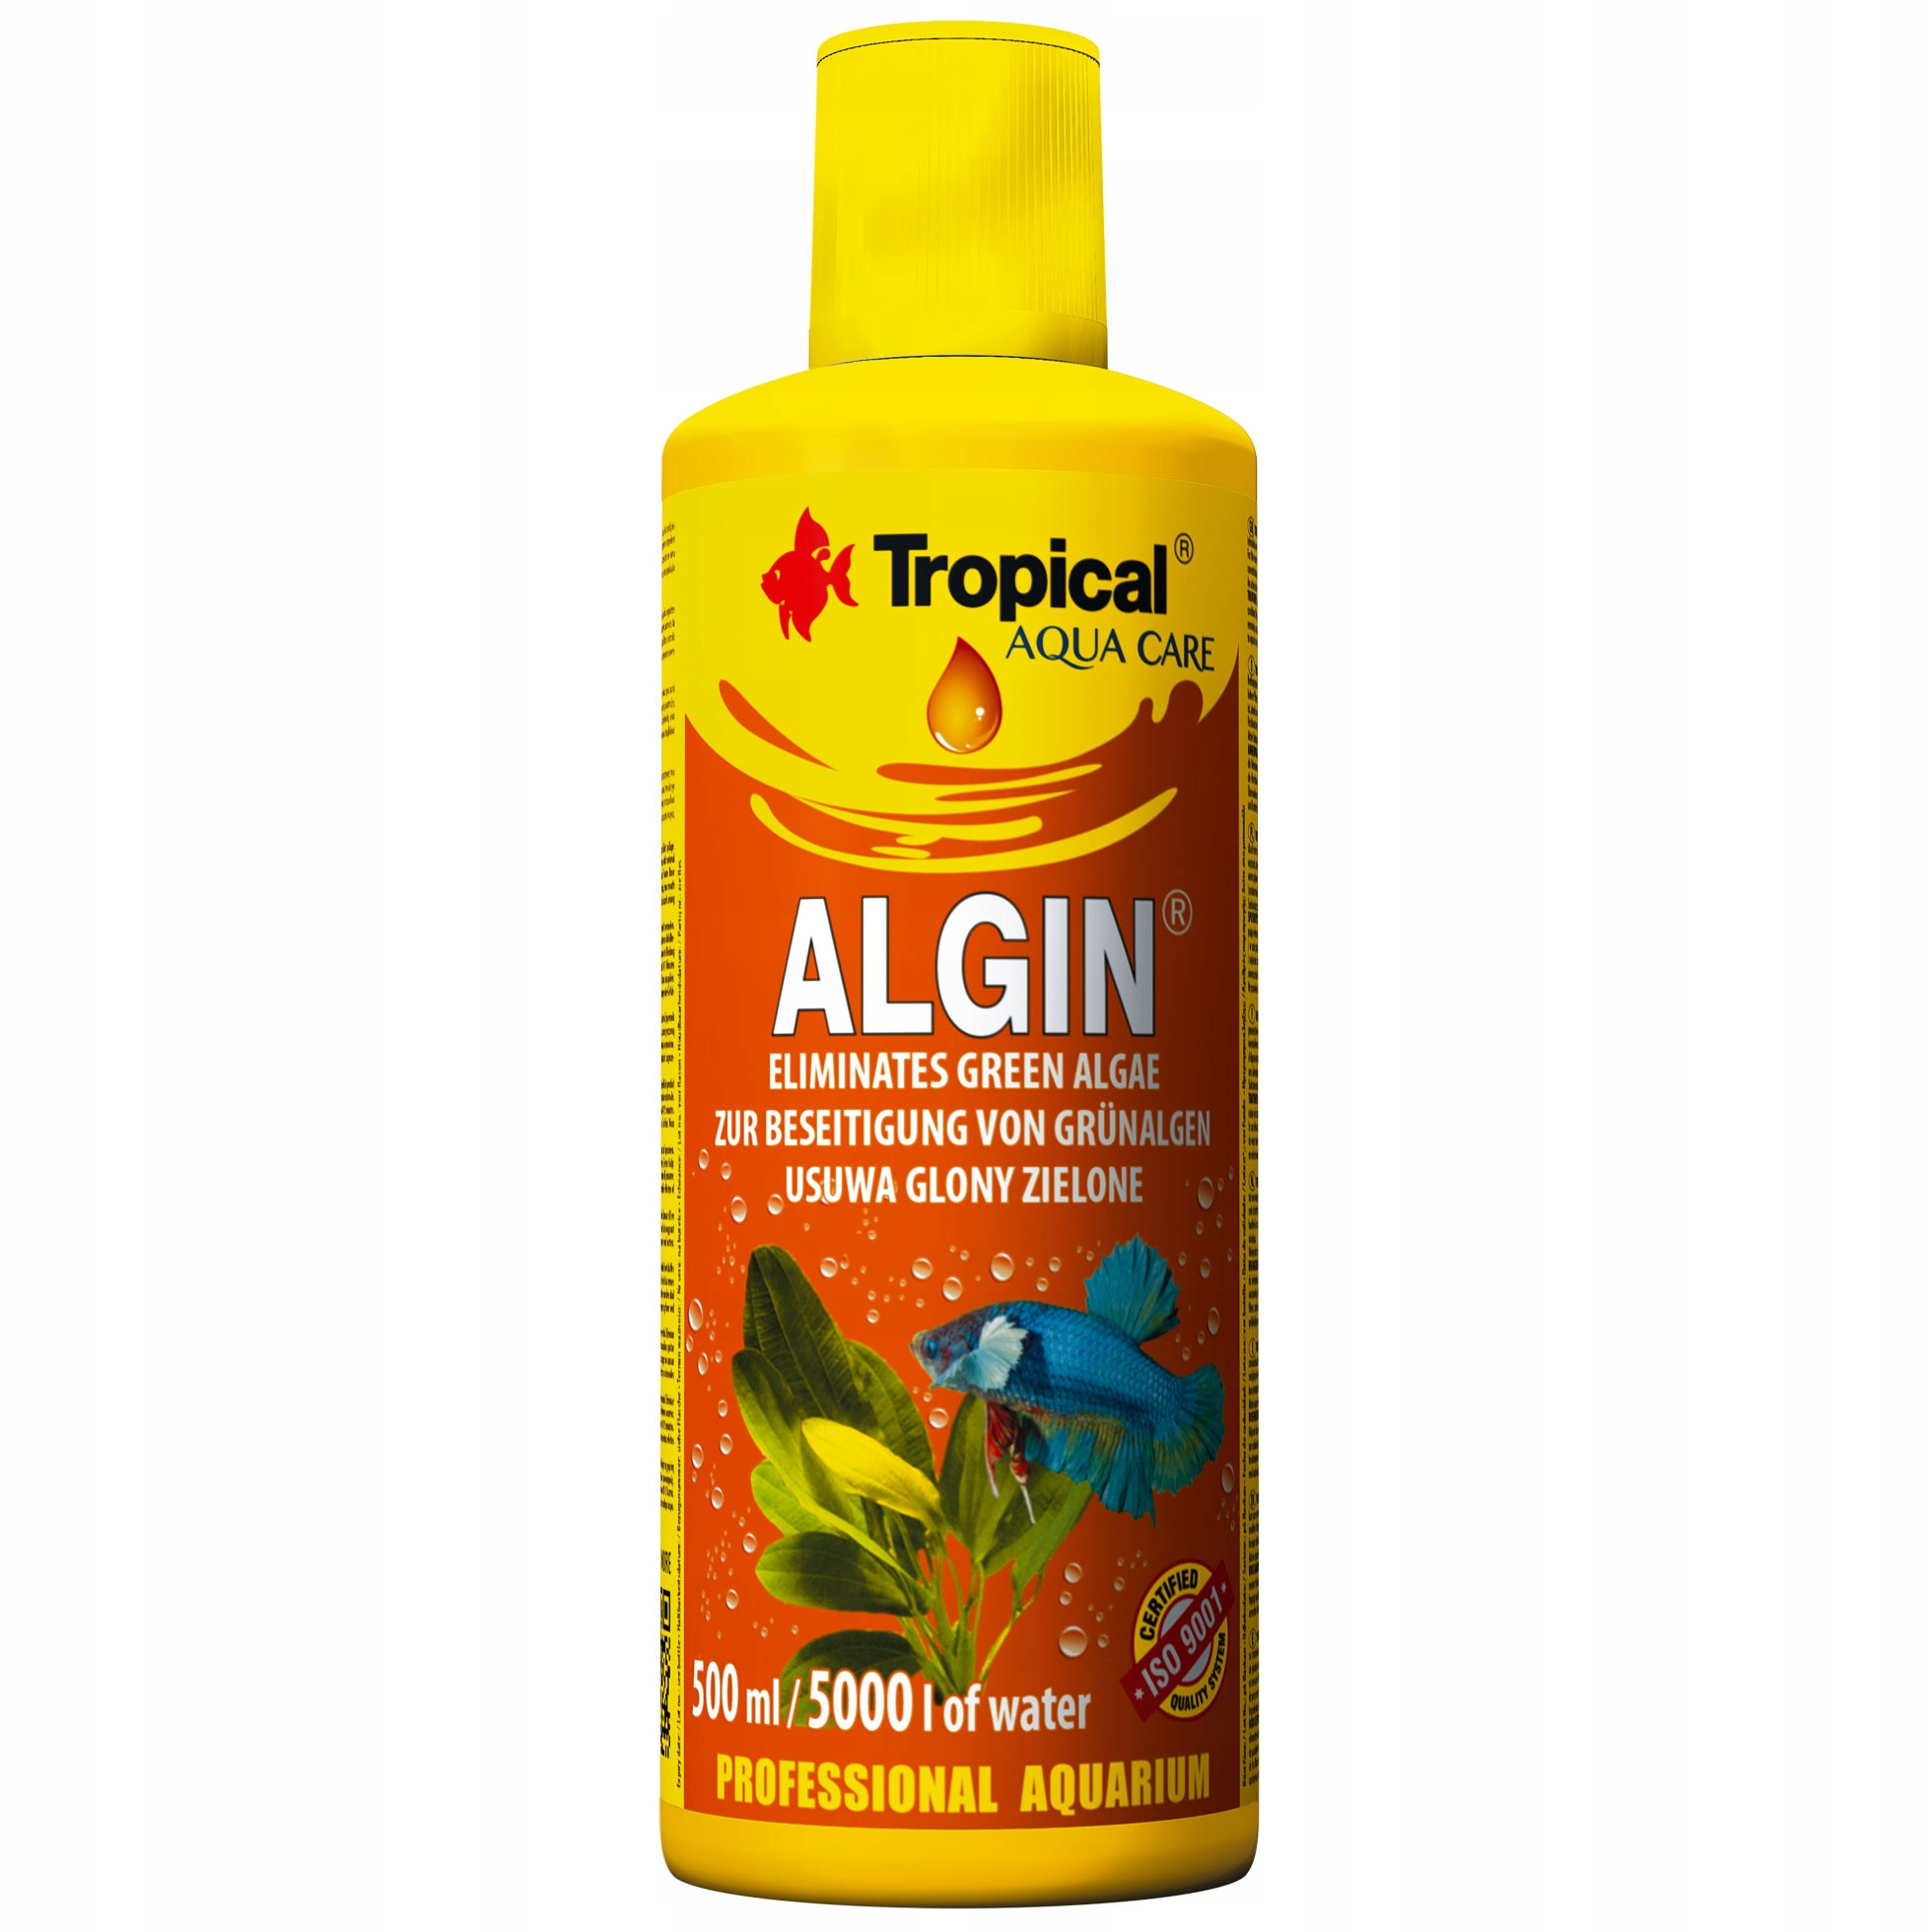 Tropical ALGIN 500 мл - Antyglon - конец с водорослями